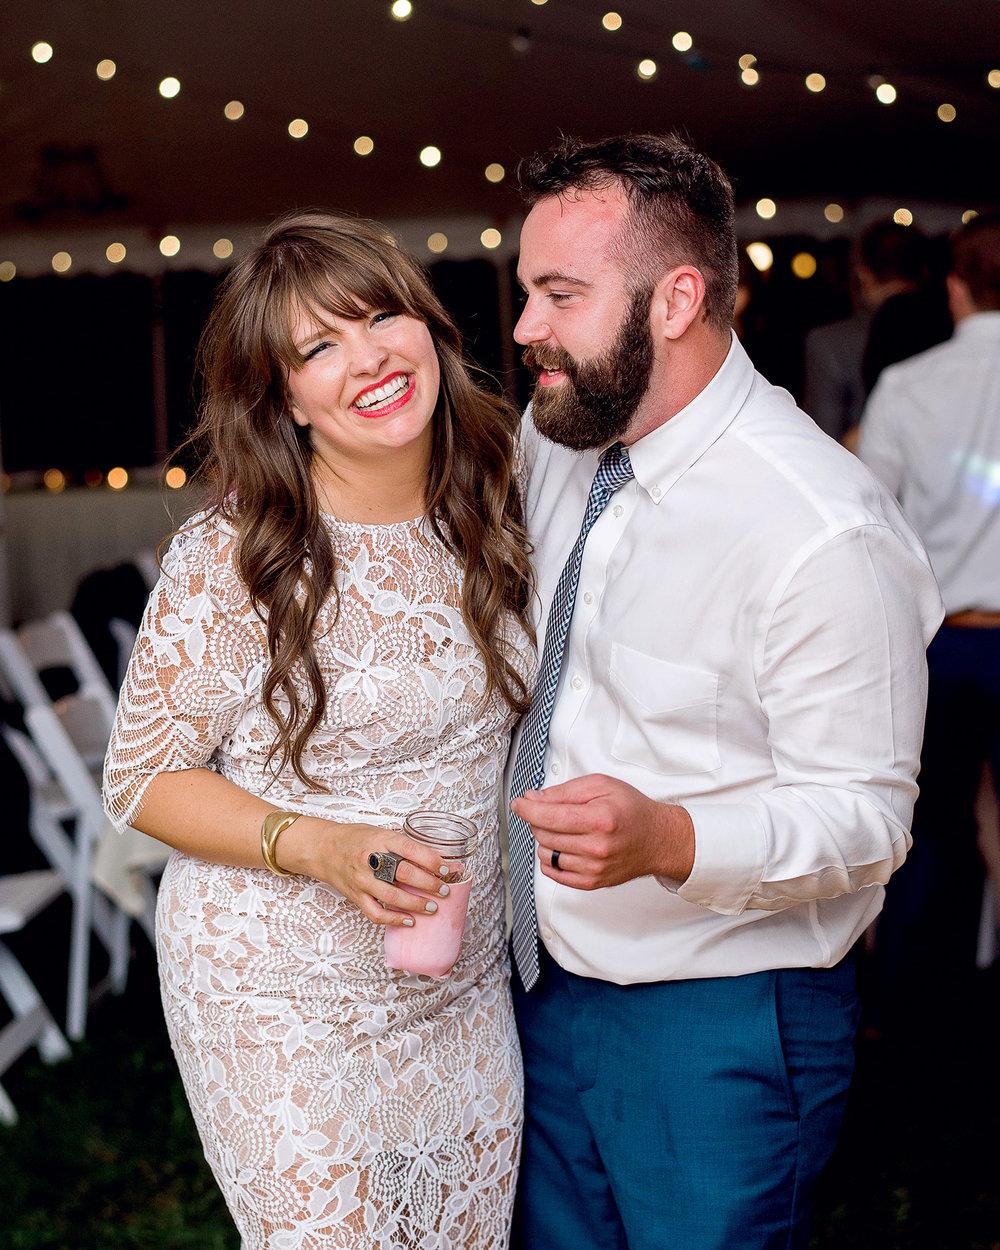 Wedding Photographer-1.jpg